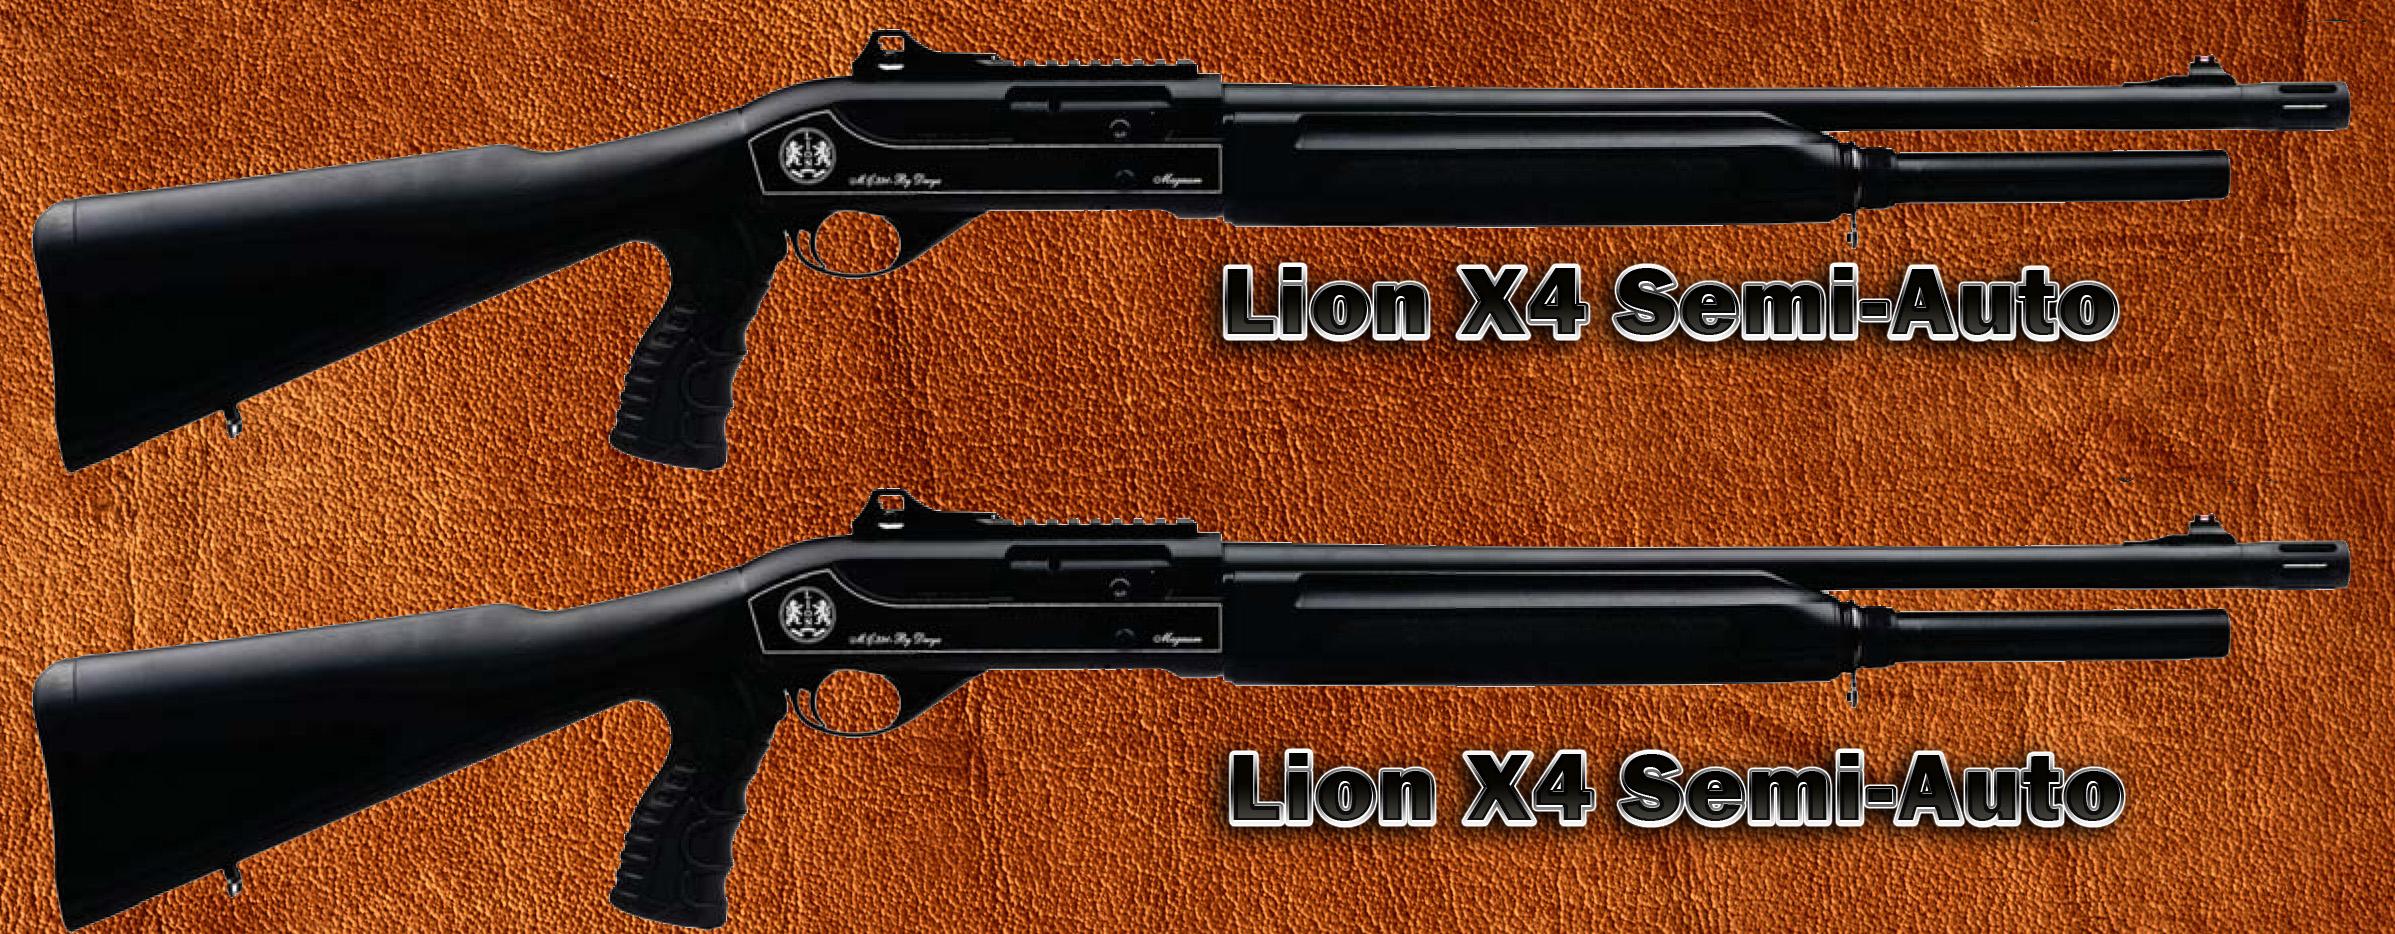 Lion X4 Tactical Semiautomatic Shotgun 12 gauge 3 inch ...